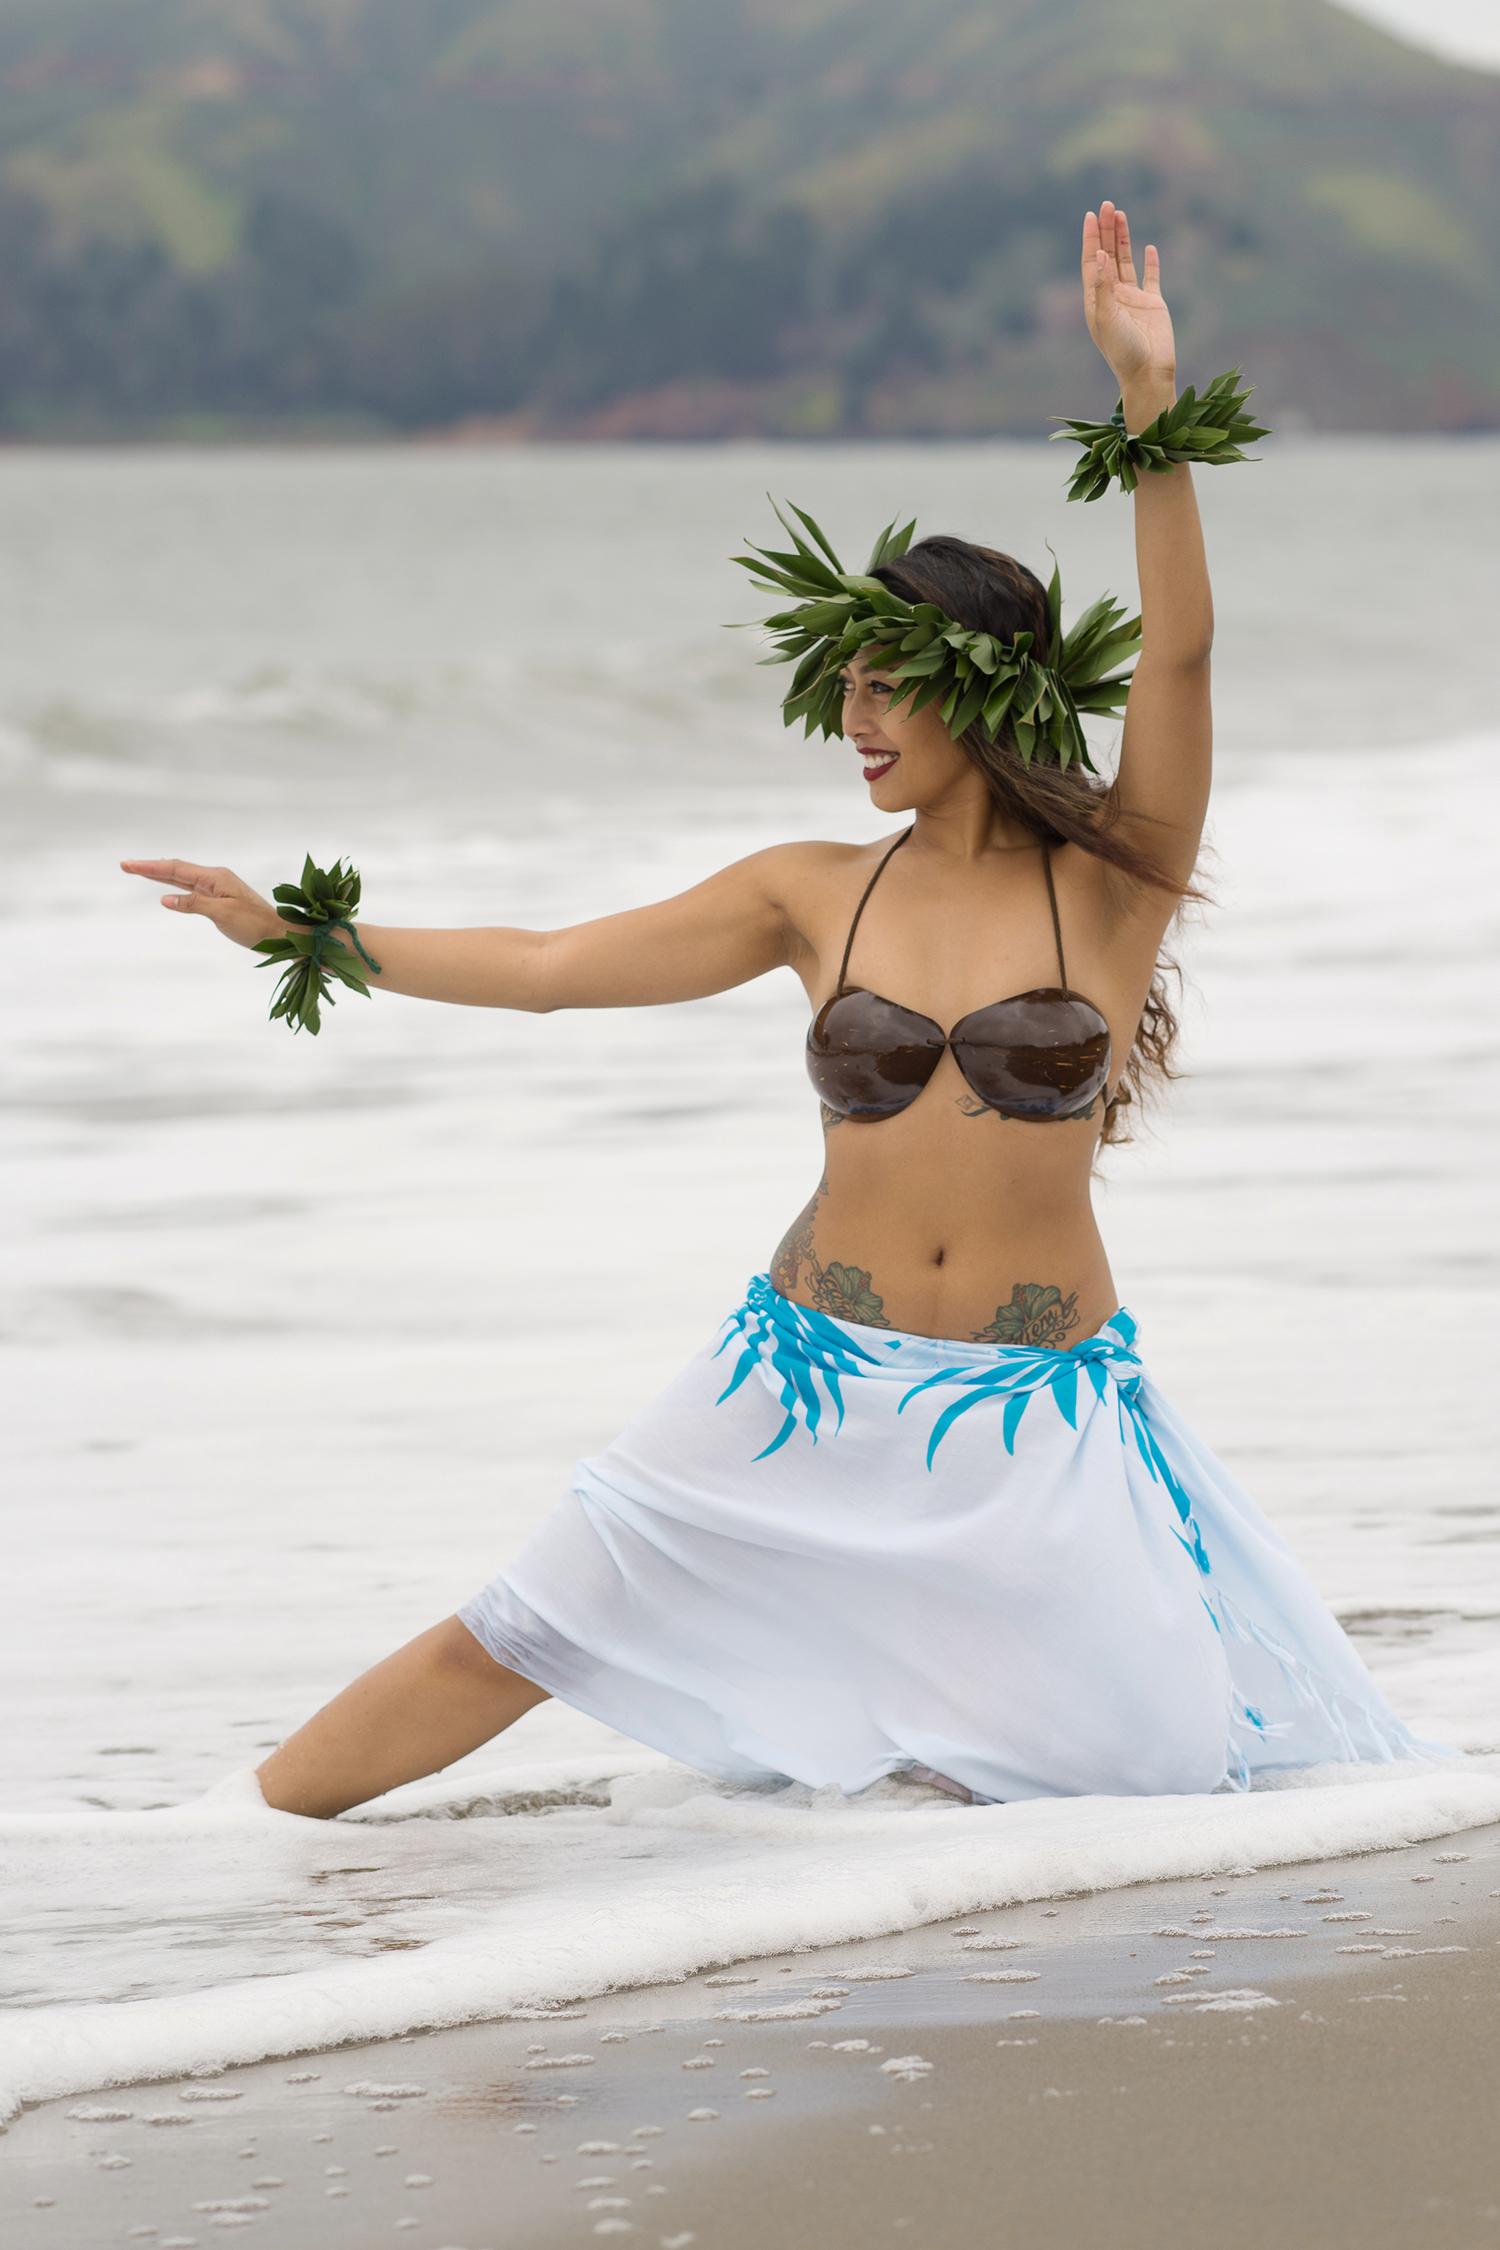 Manuia-Polynesian-Revue-Portrait-Luxchromatic-Photography-Hula-Dance-San-Francisco-Bay-Area-Sony-Alpha-A7Rii-Zeiss-Lens-Profoto-B1-B2-Wescott-Aloha-SonyAlpha-1140.jpg